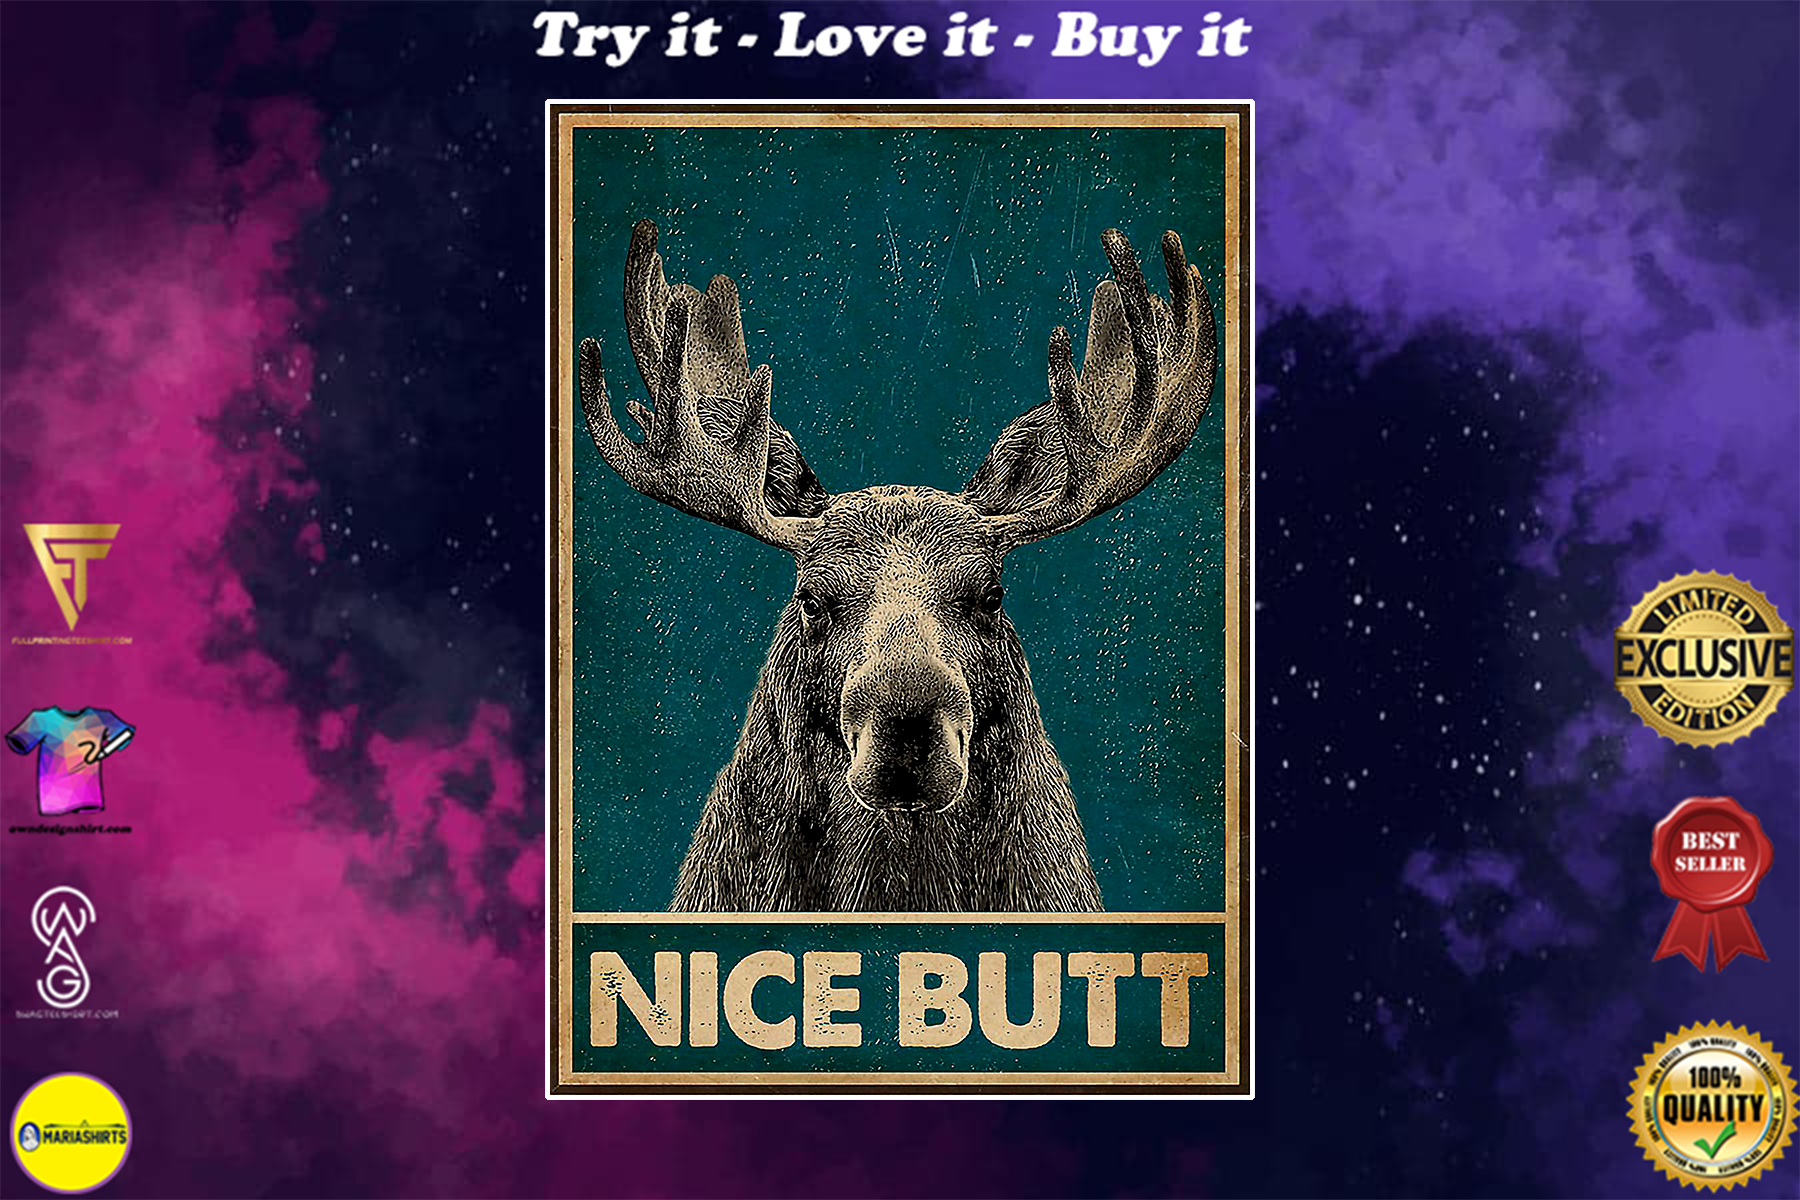 vintage nice butt moose poster